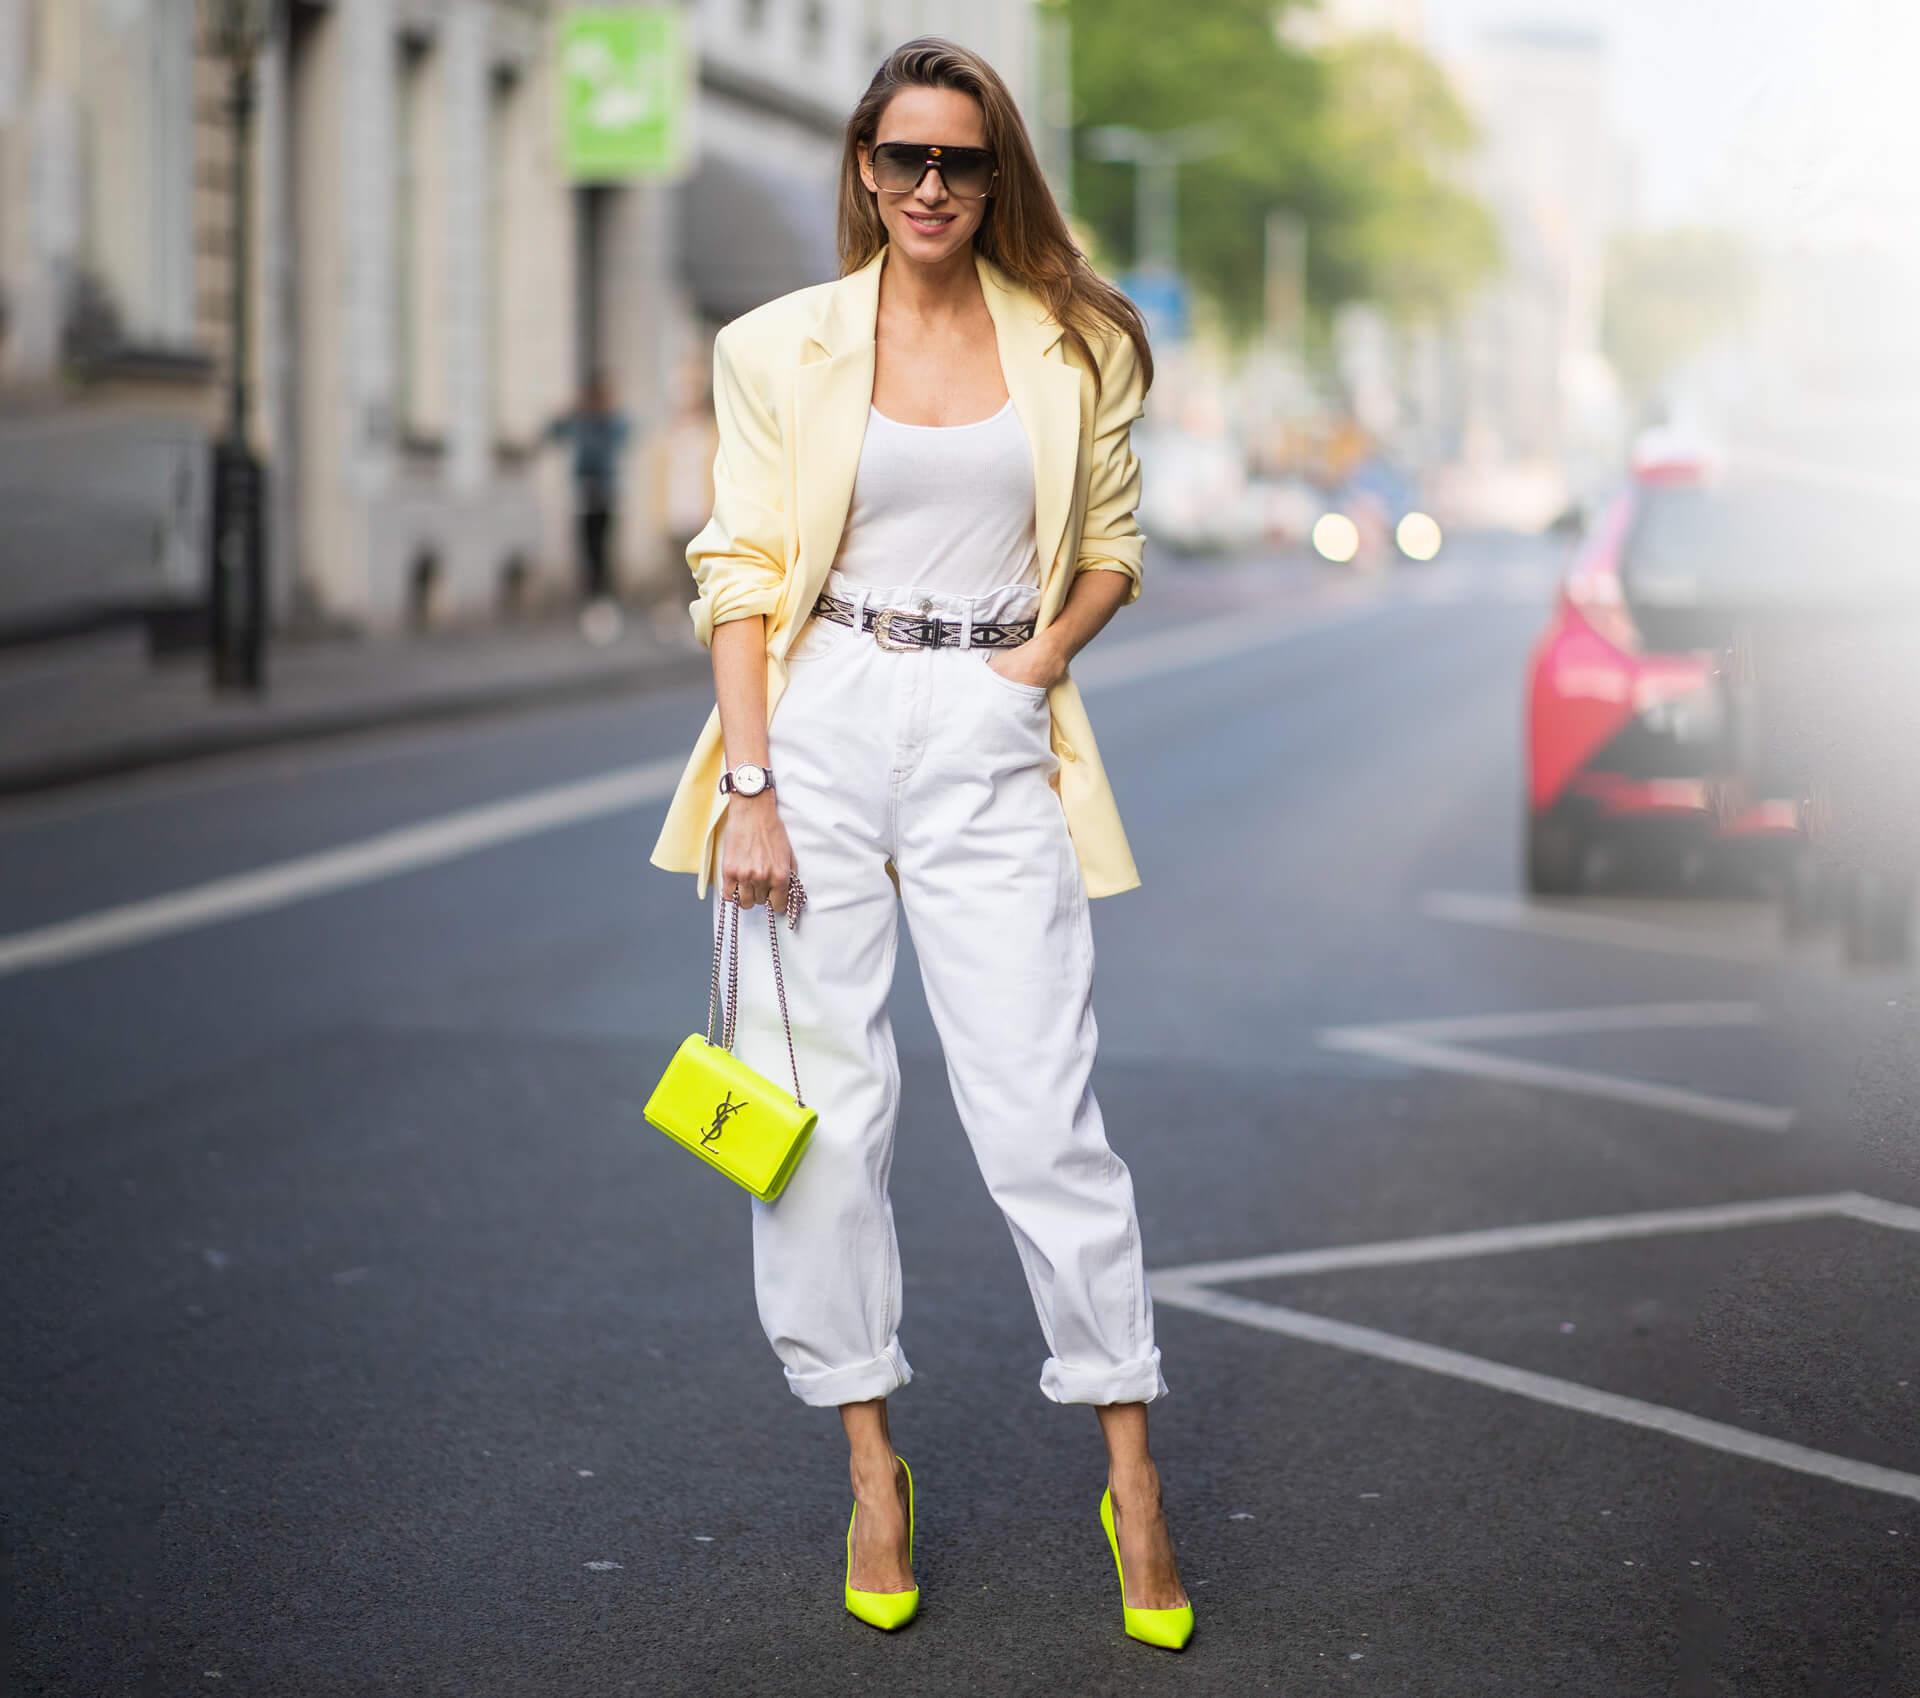 Neon Schuhe Trend